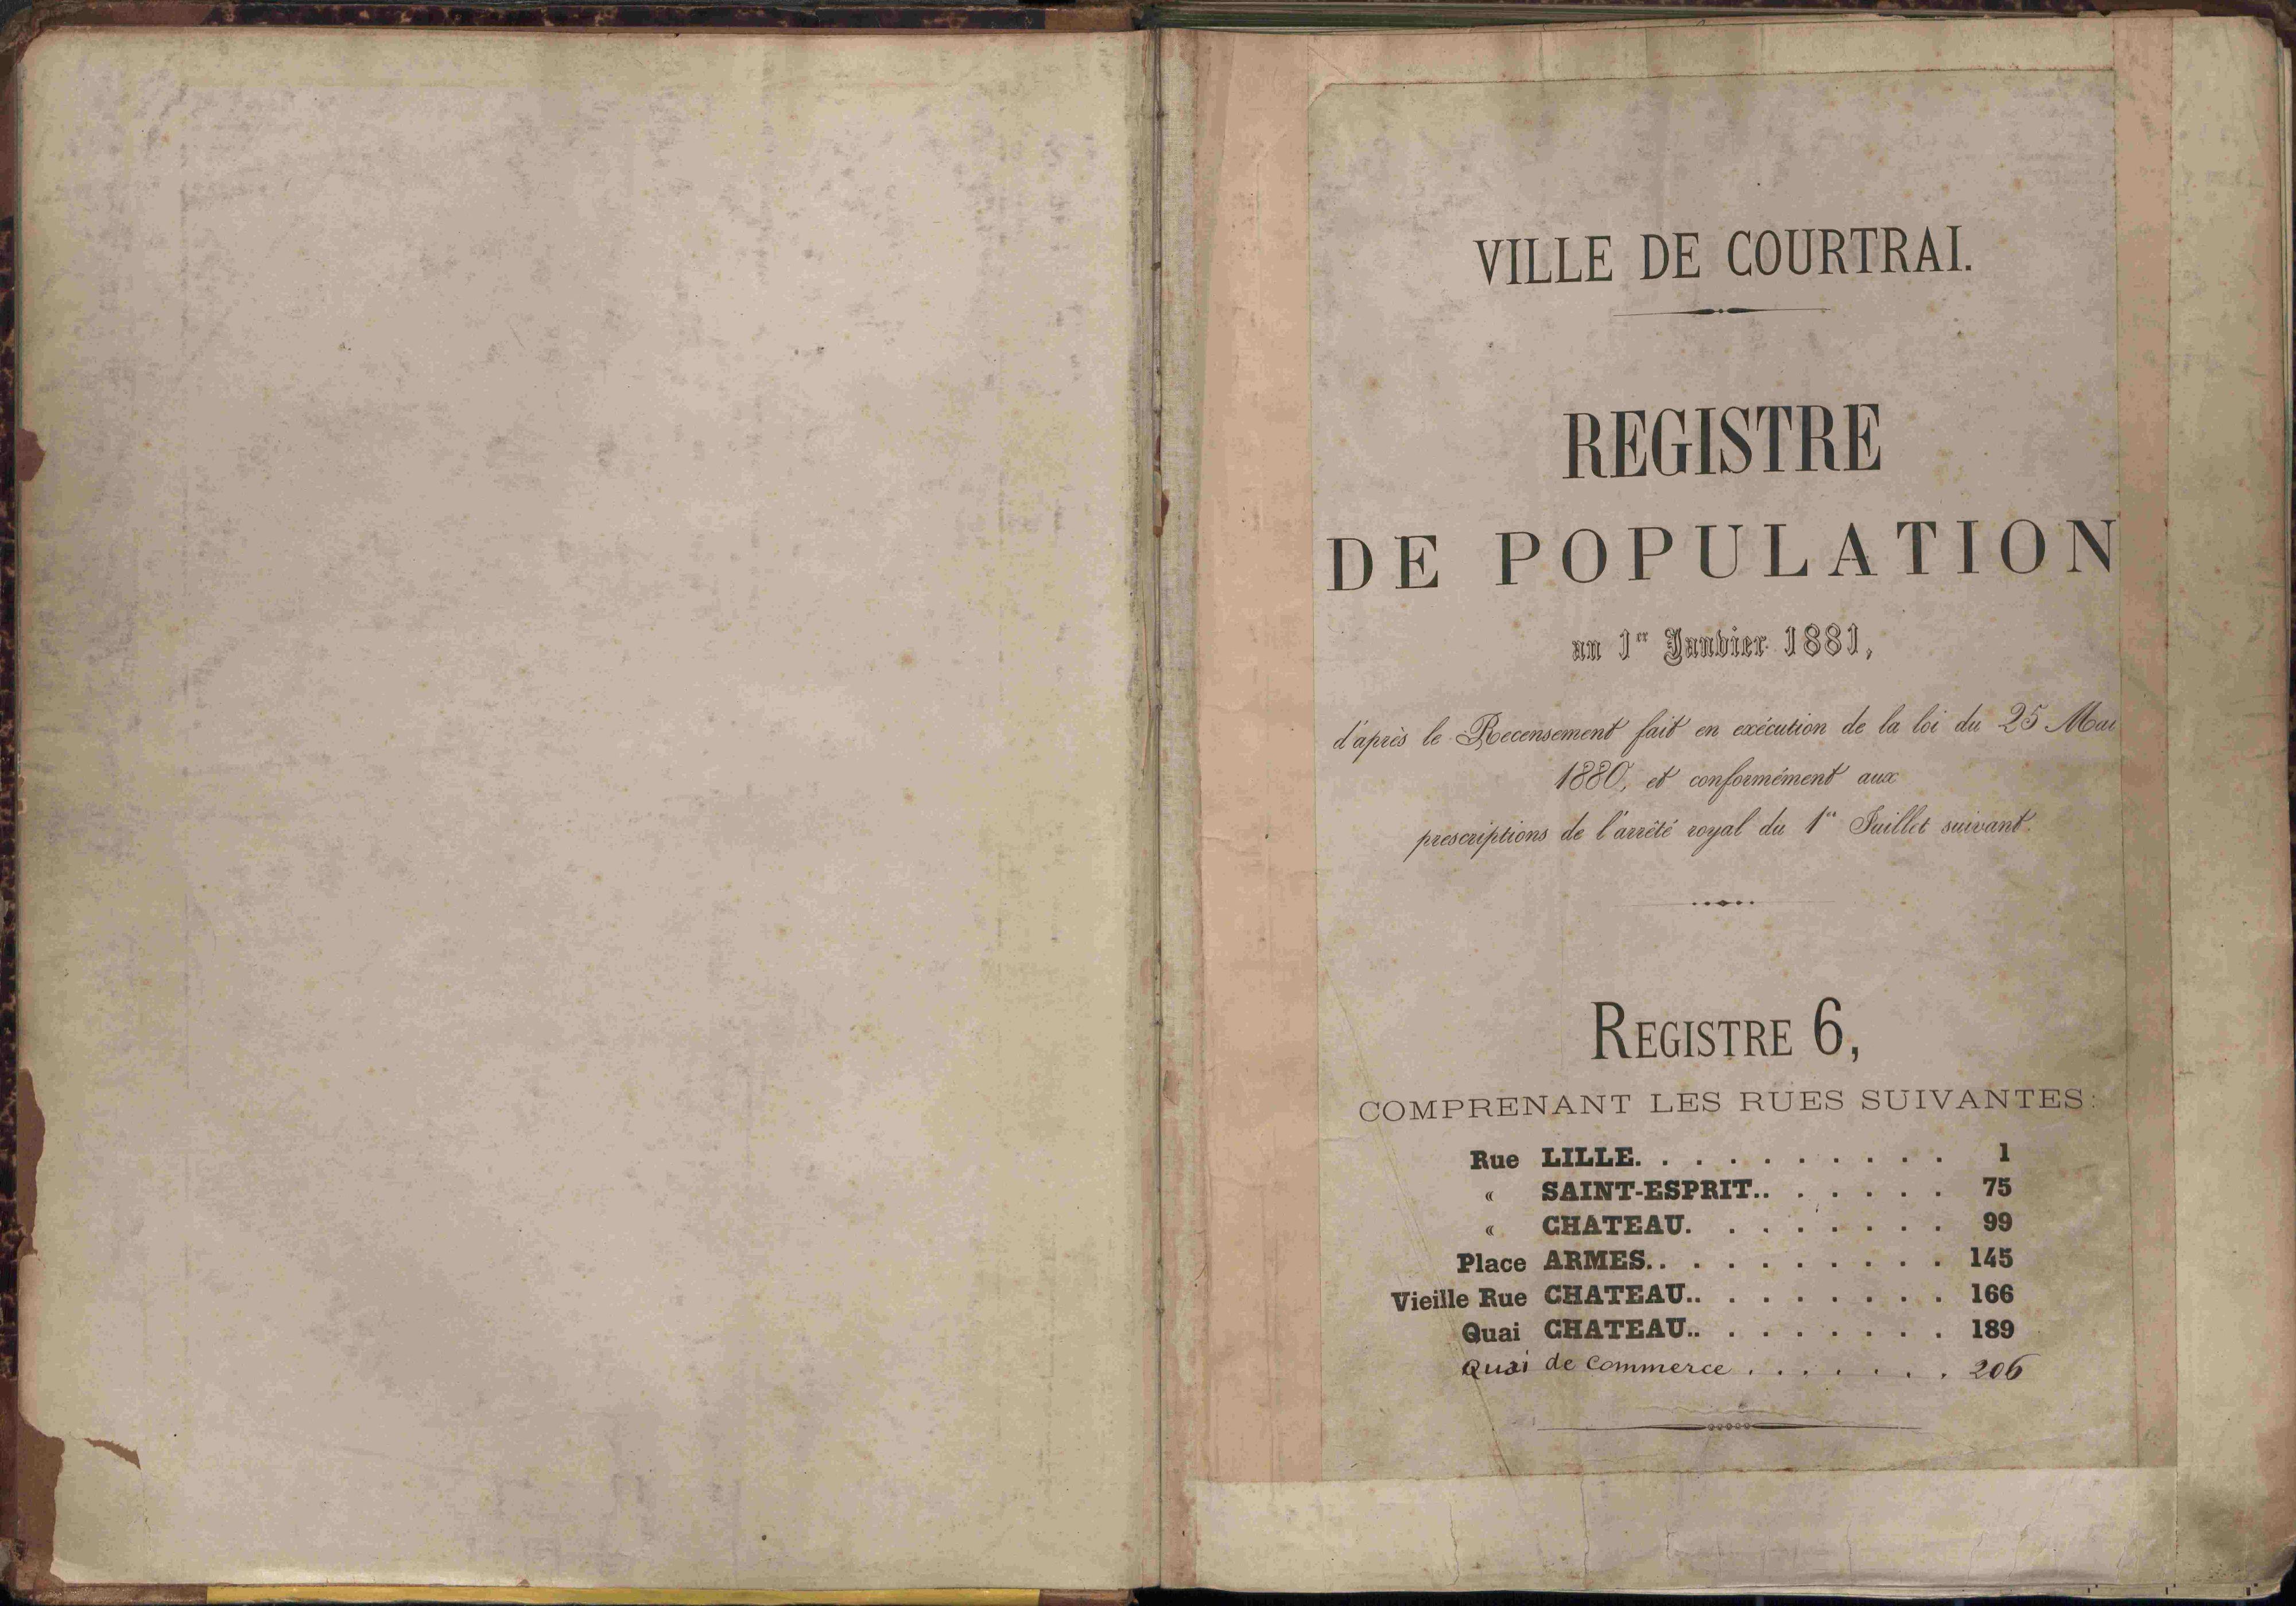 Bevolkingsregister Kortrijk 1880 boek 6